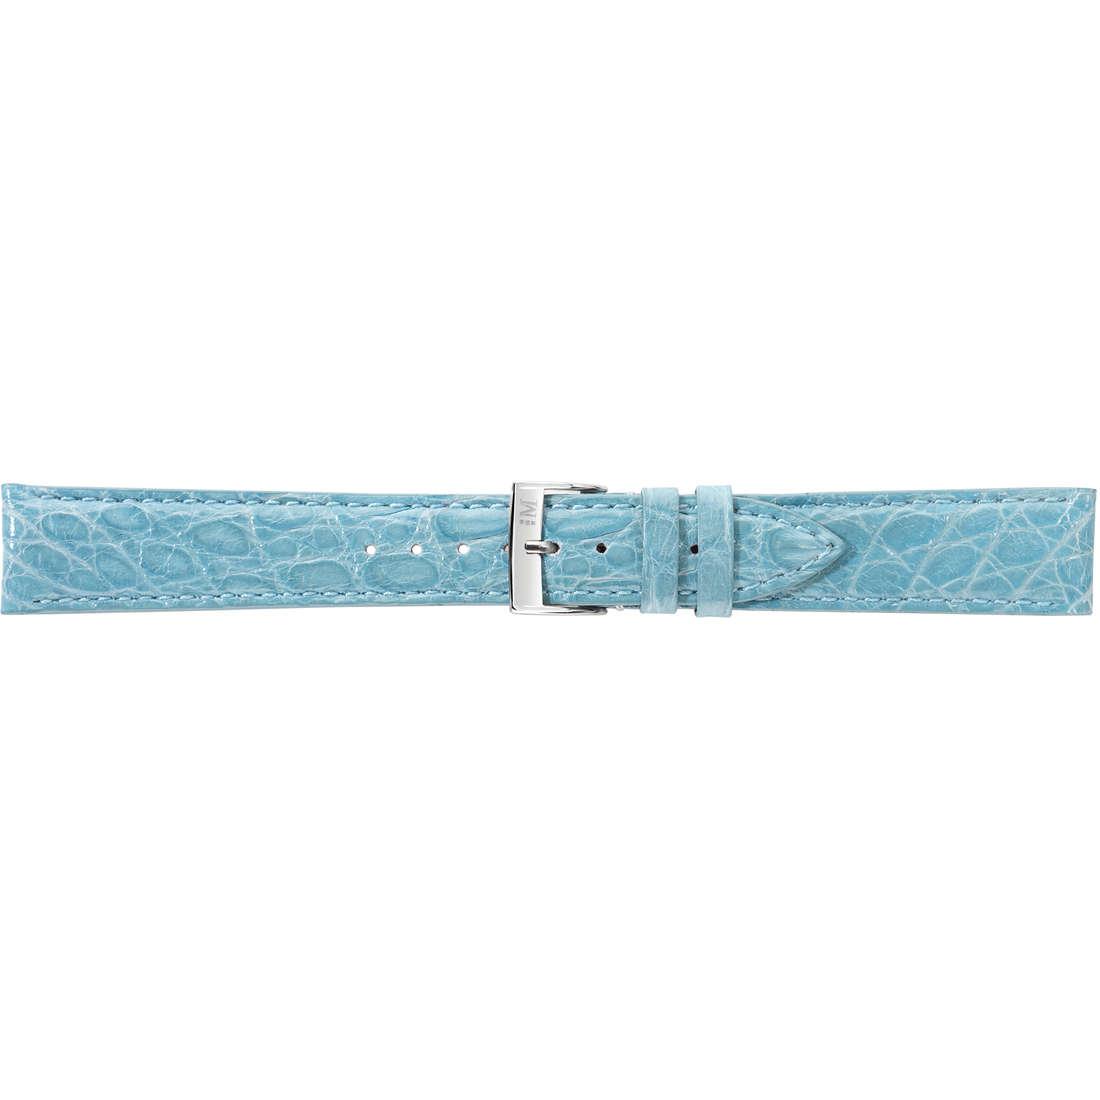 watch watch bands watch straps man Morellato Pelli Preziose A01X2197052168CR16